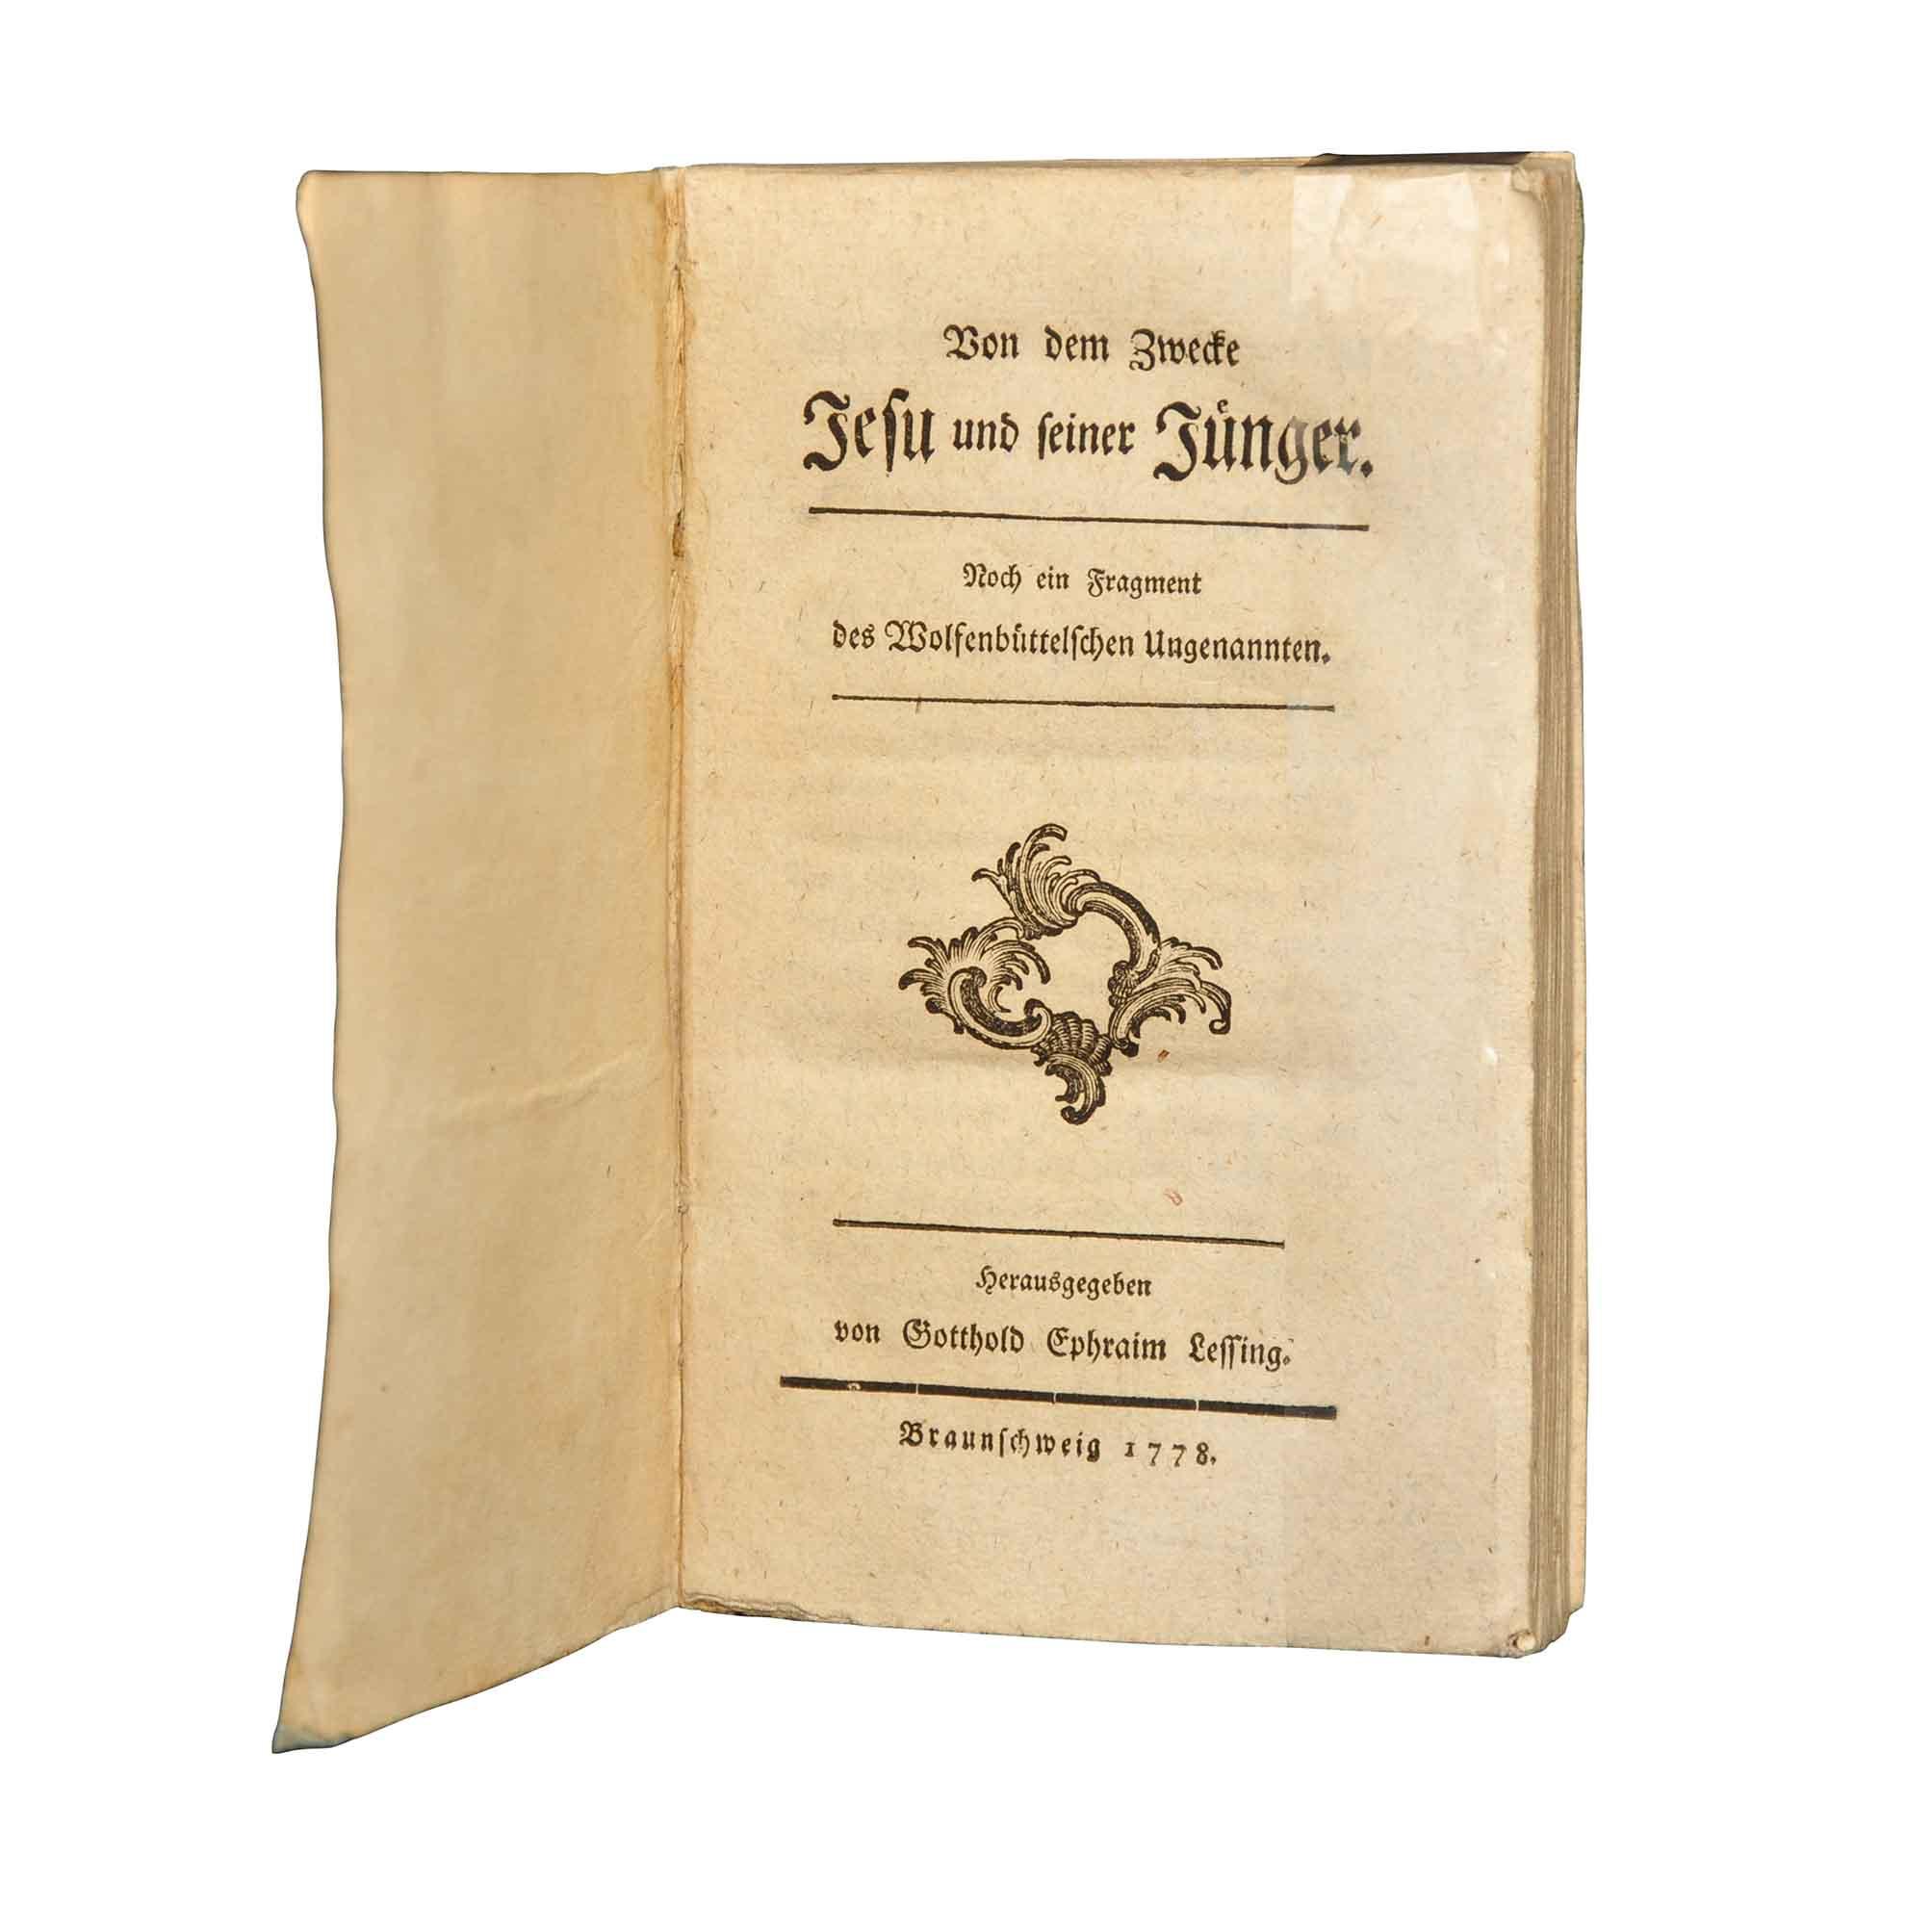 1123-Lessing-Jesu-1788-Titel-offen-frei-N.jpg